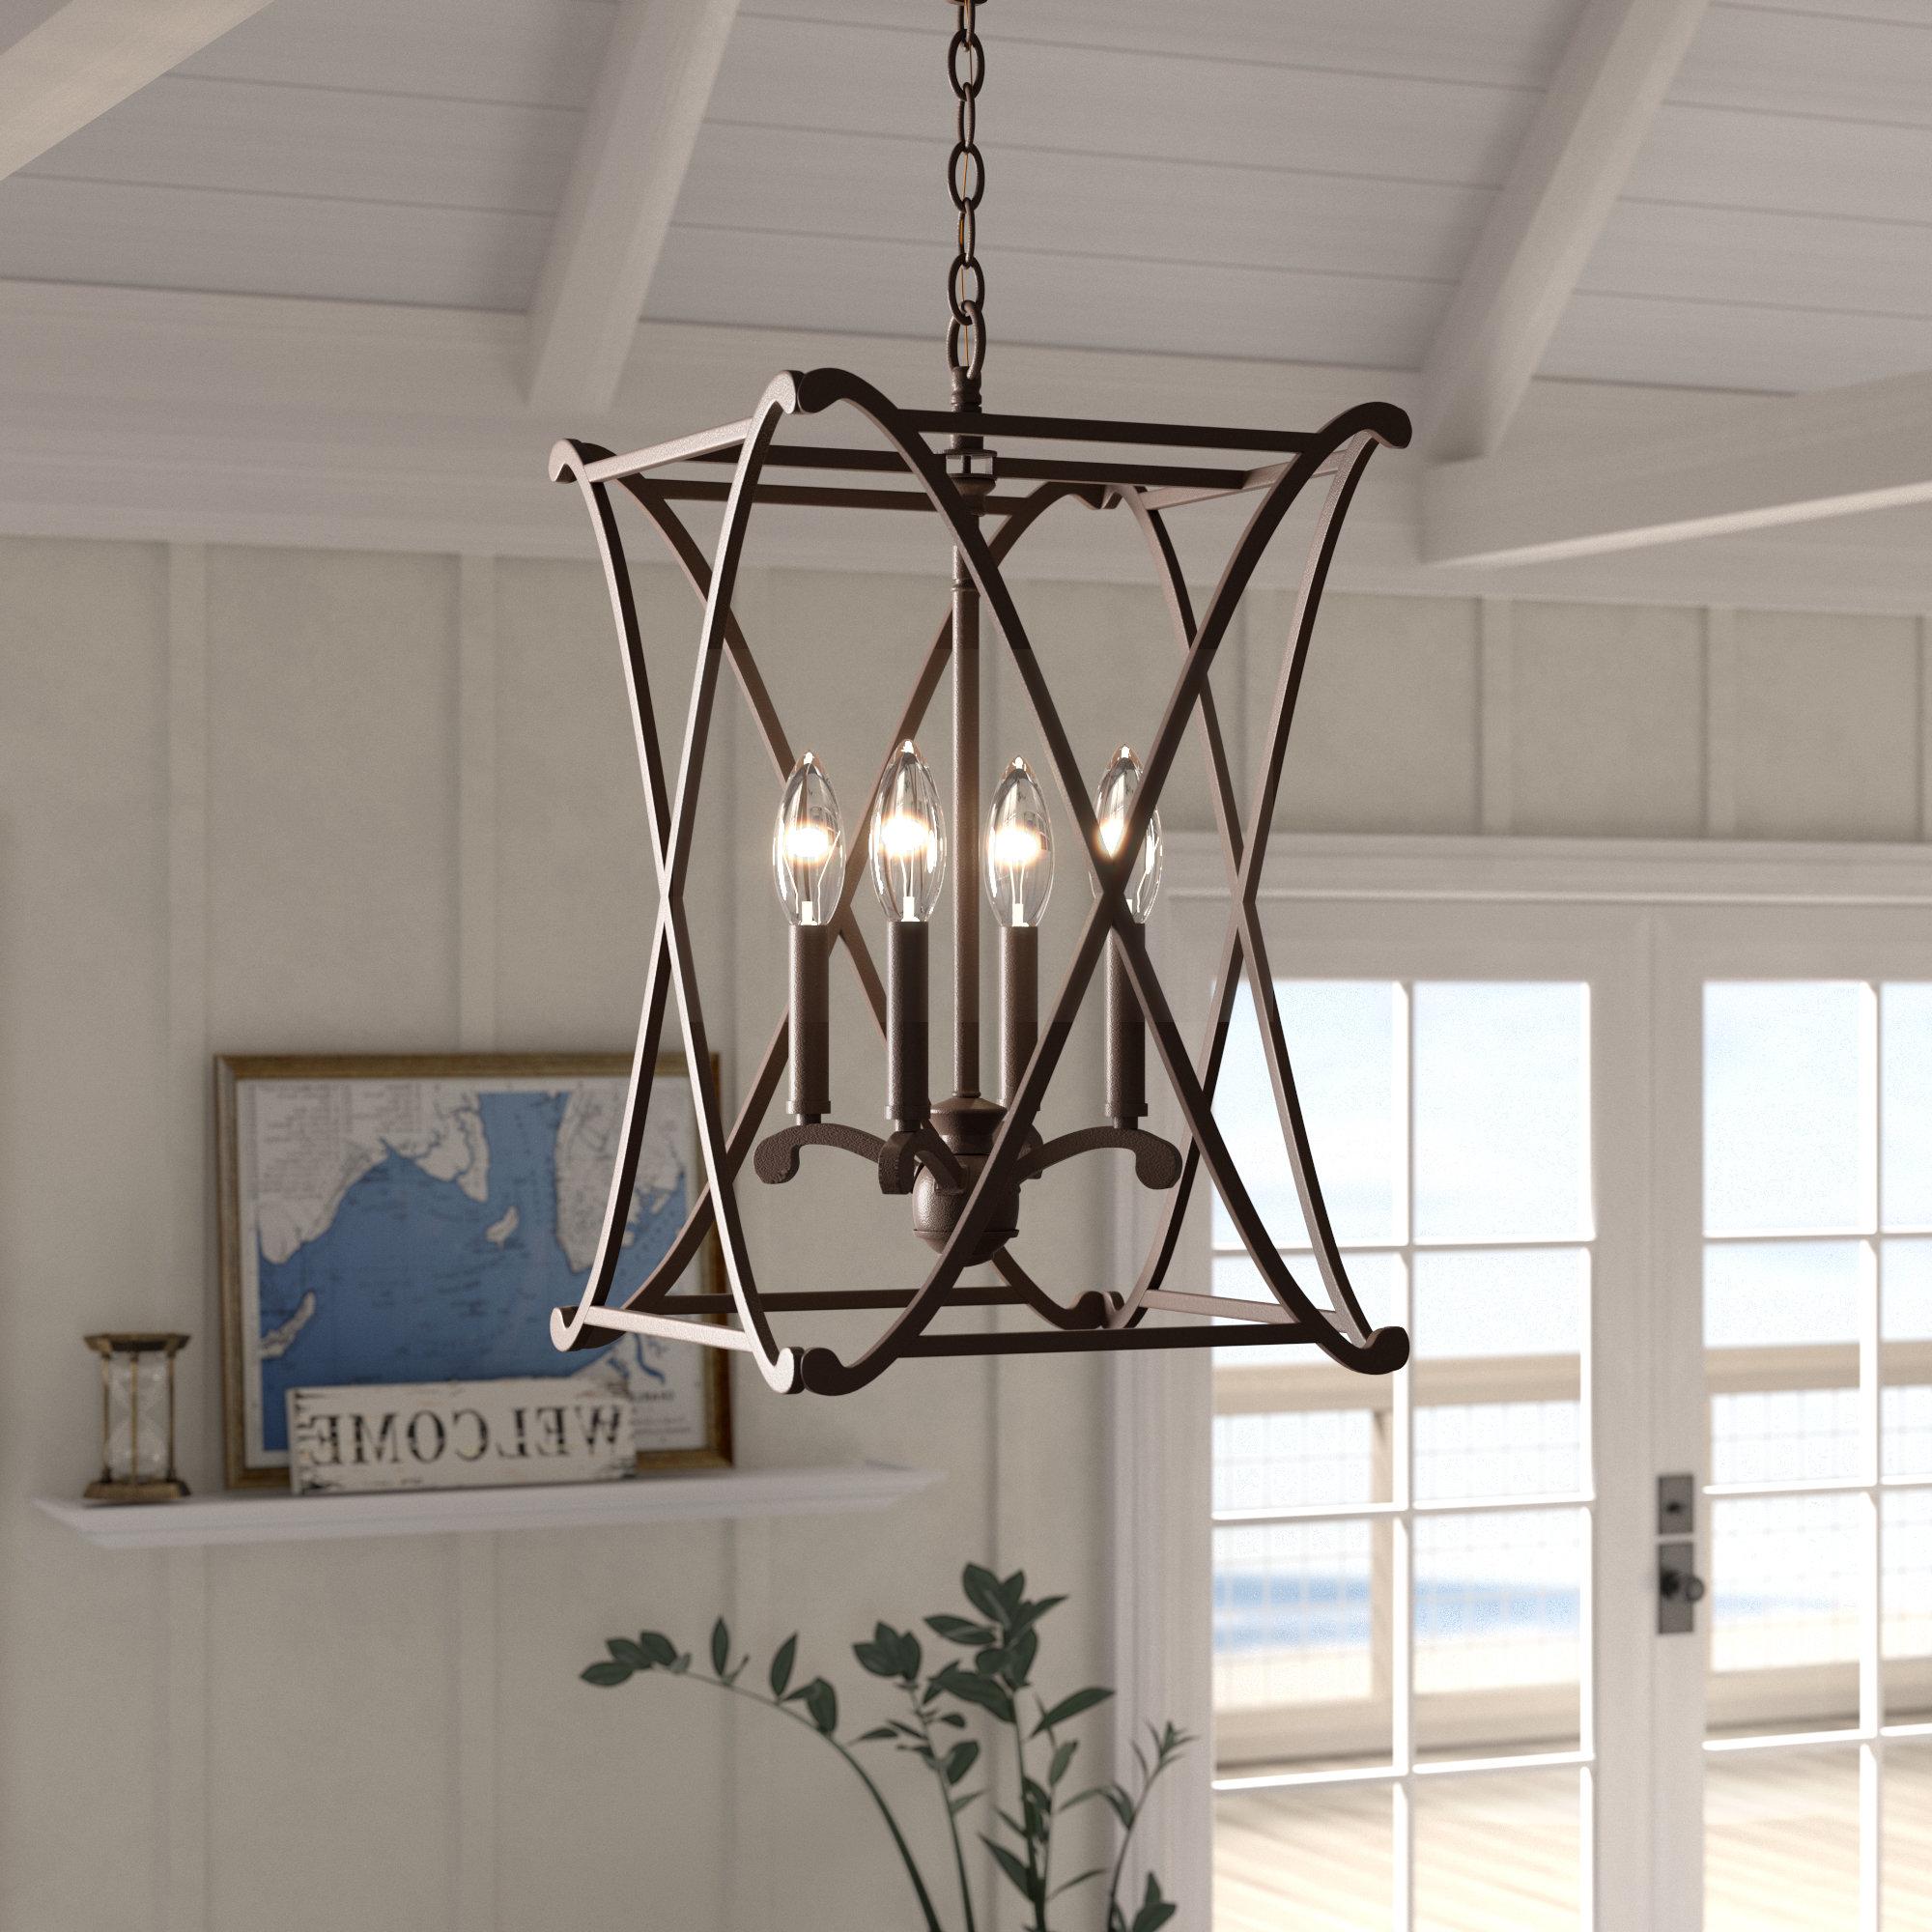 Nisbet 4-Light Lantern Geometric Pendant intended for Fashionable Taya 4-Light Lantern Square Pendants